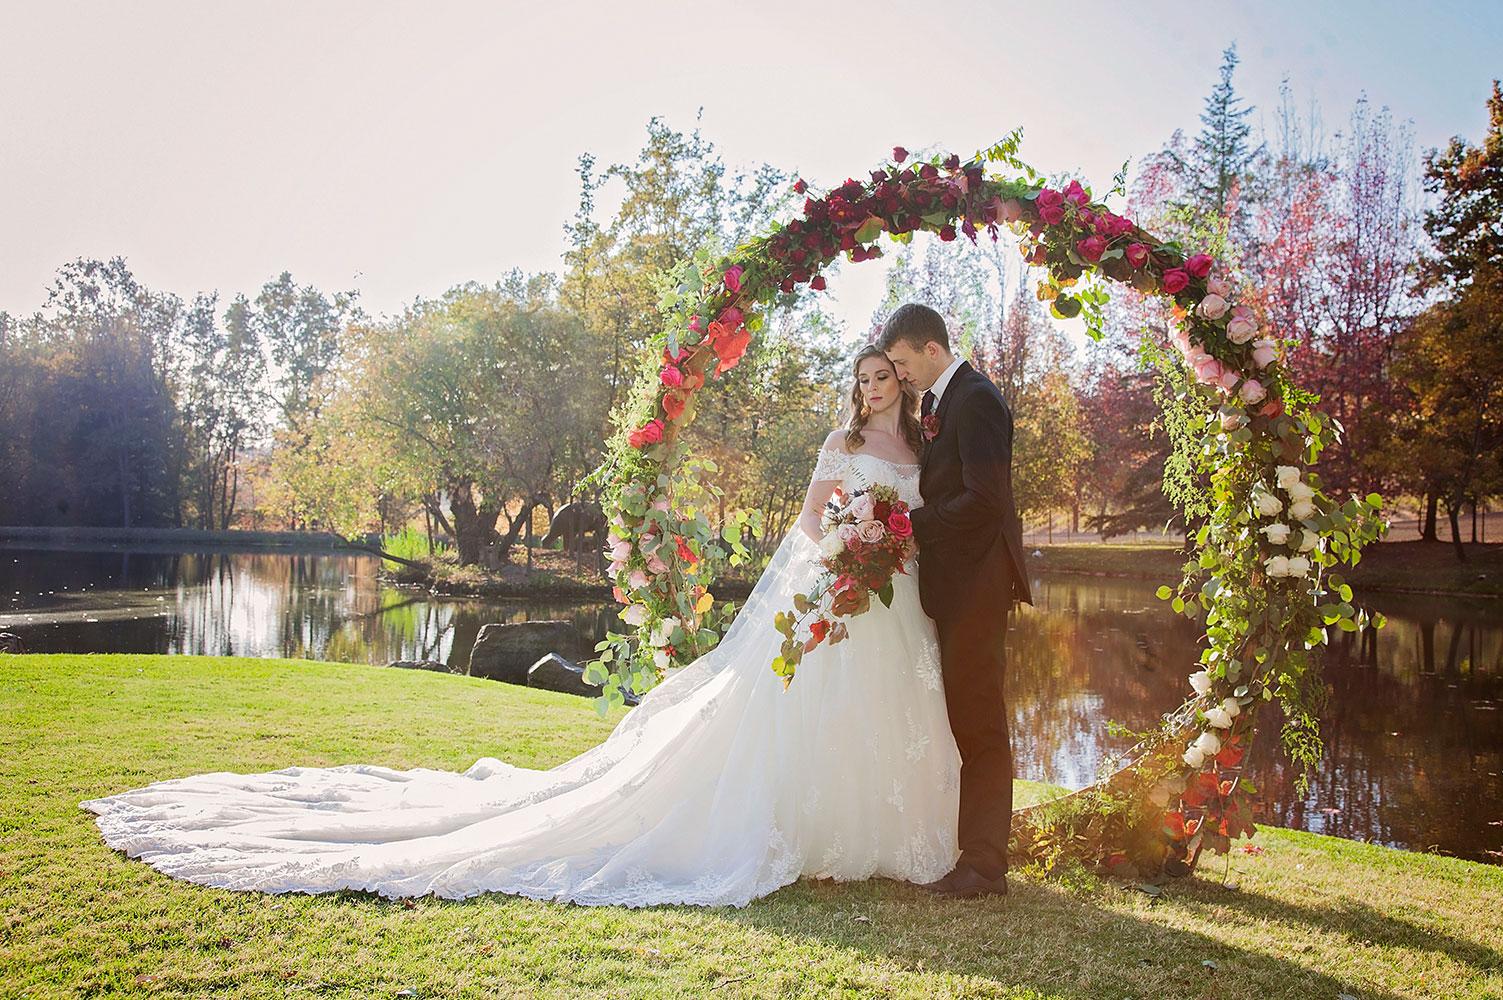 Wedding Ceremony in Murphys at Ironstone